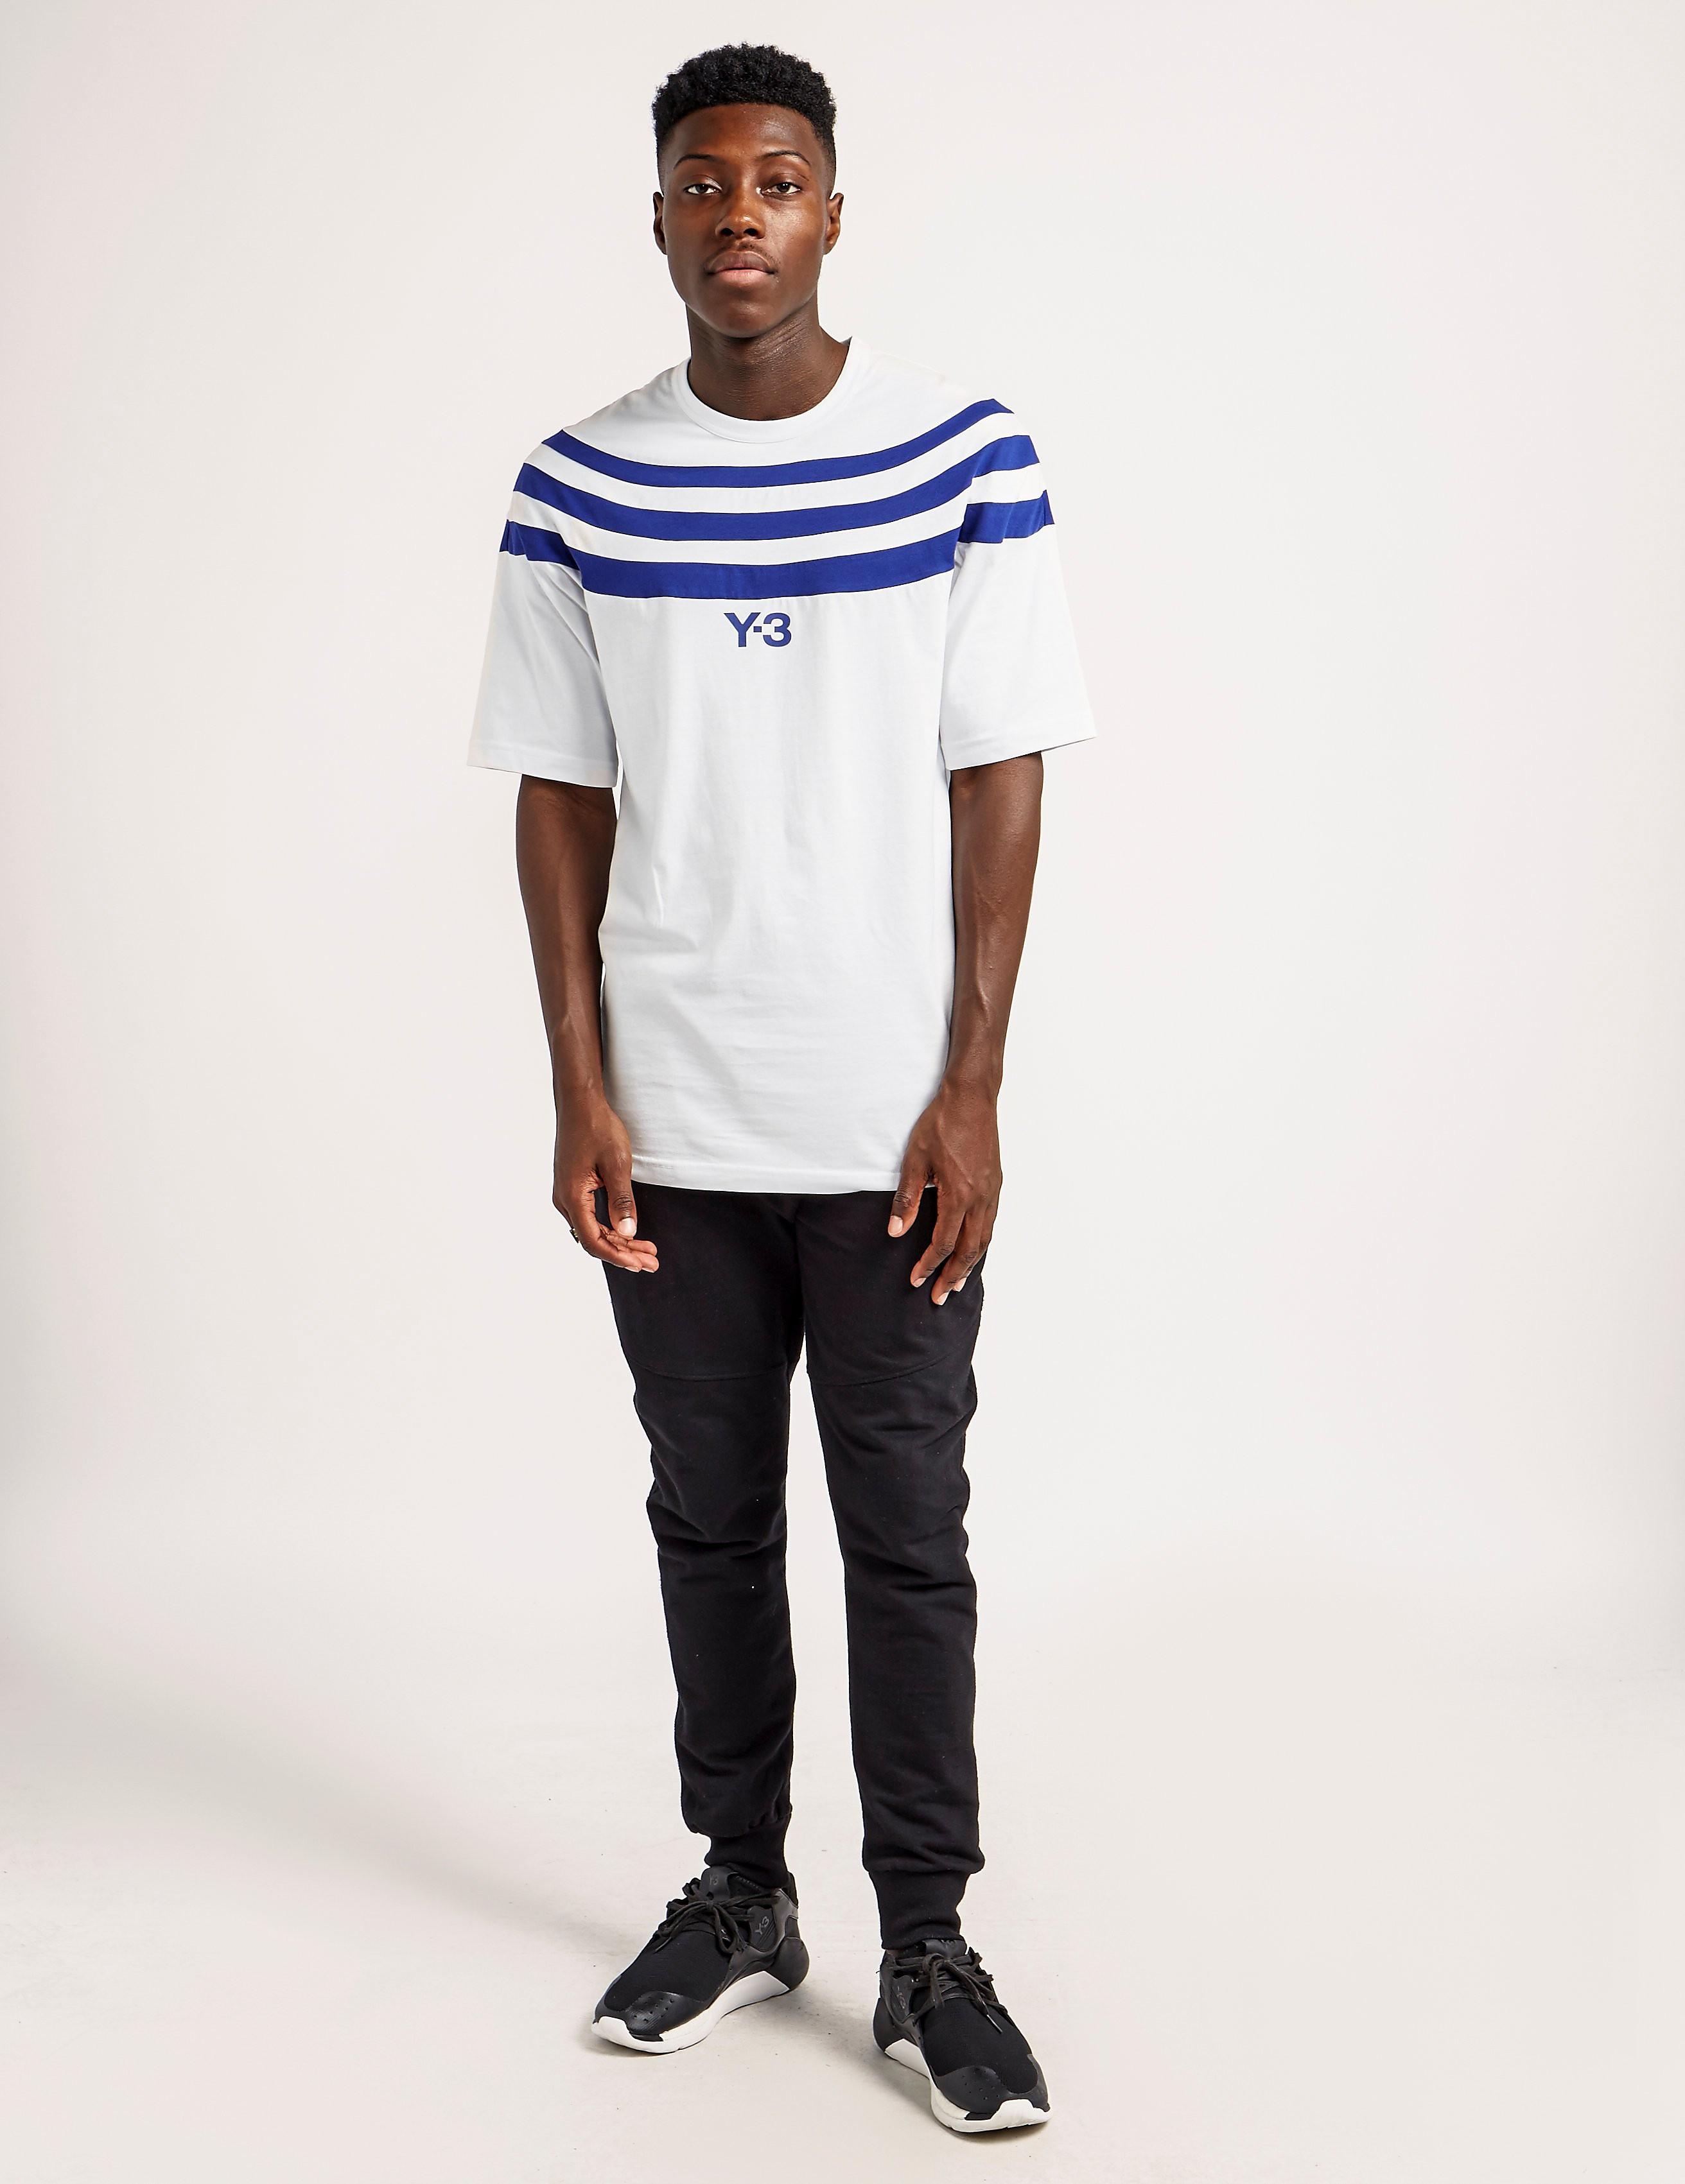 Y-3 Three Stripes Short Sleeve T-Shirt